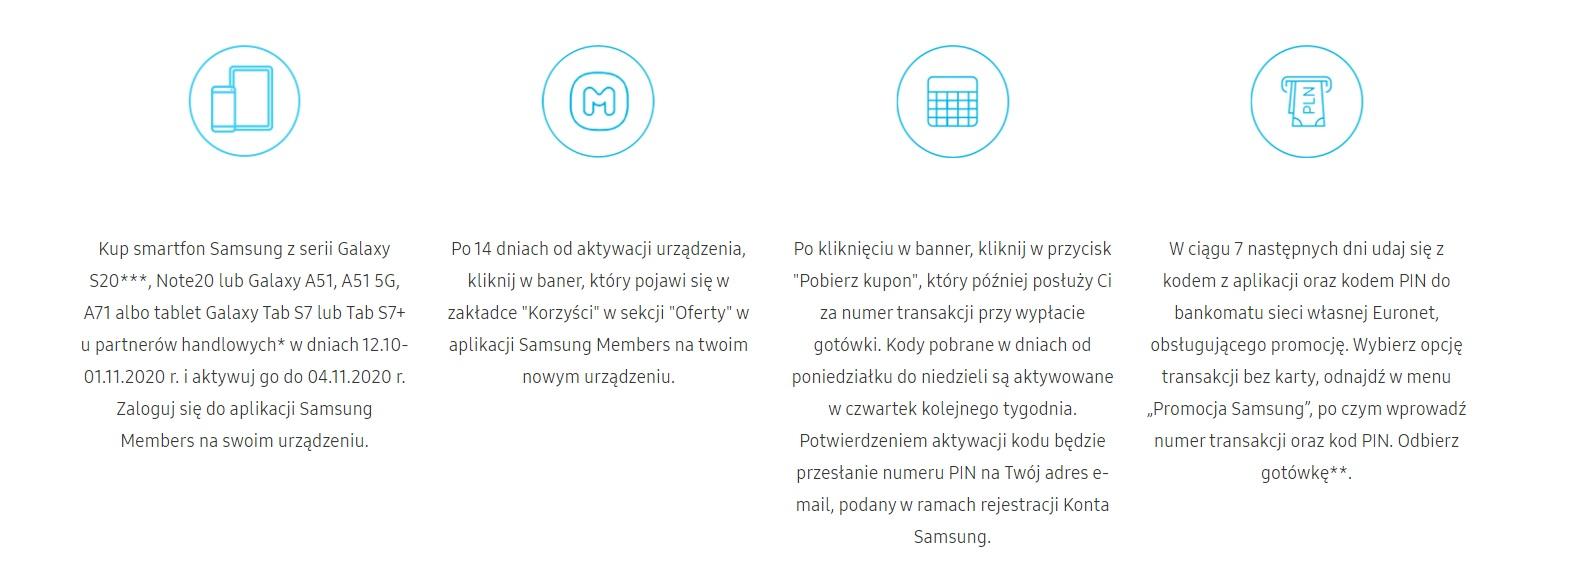 promocja Samsung premia zasady